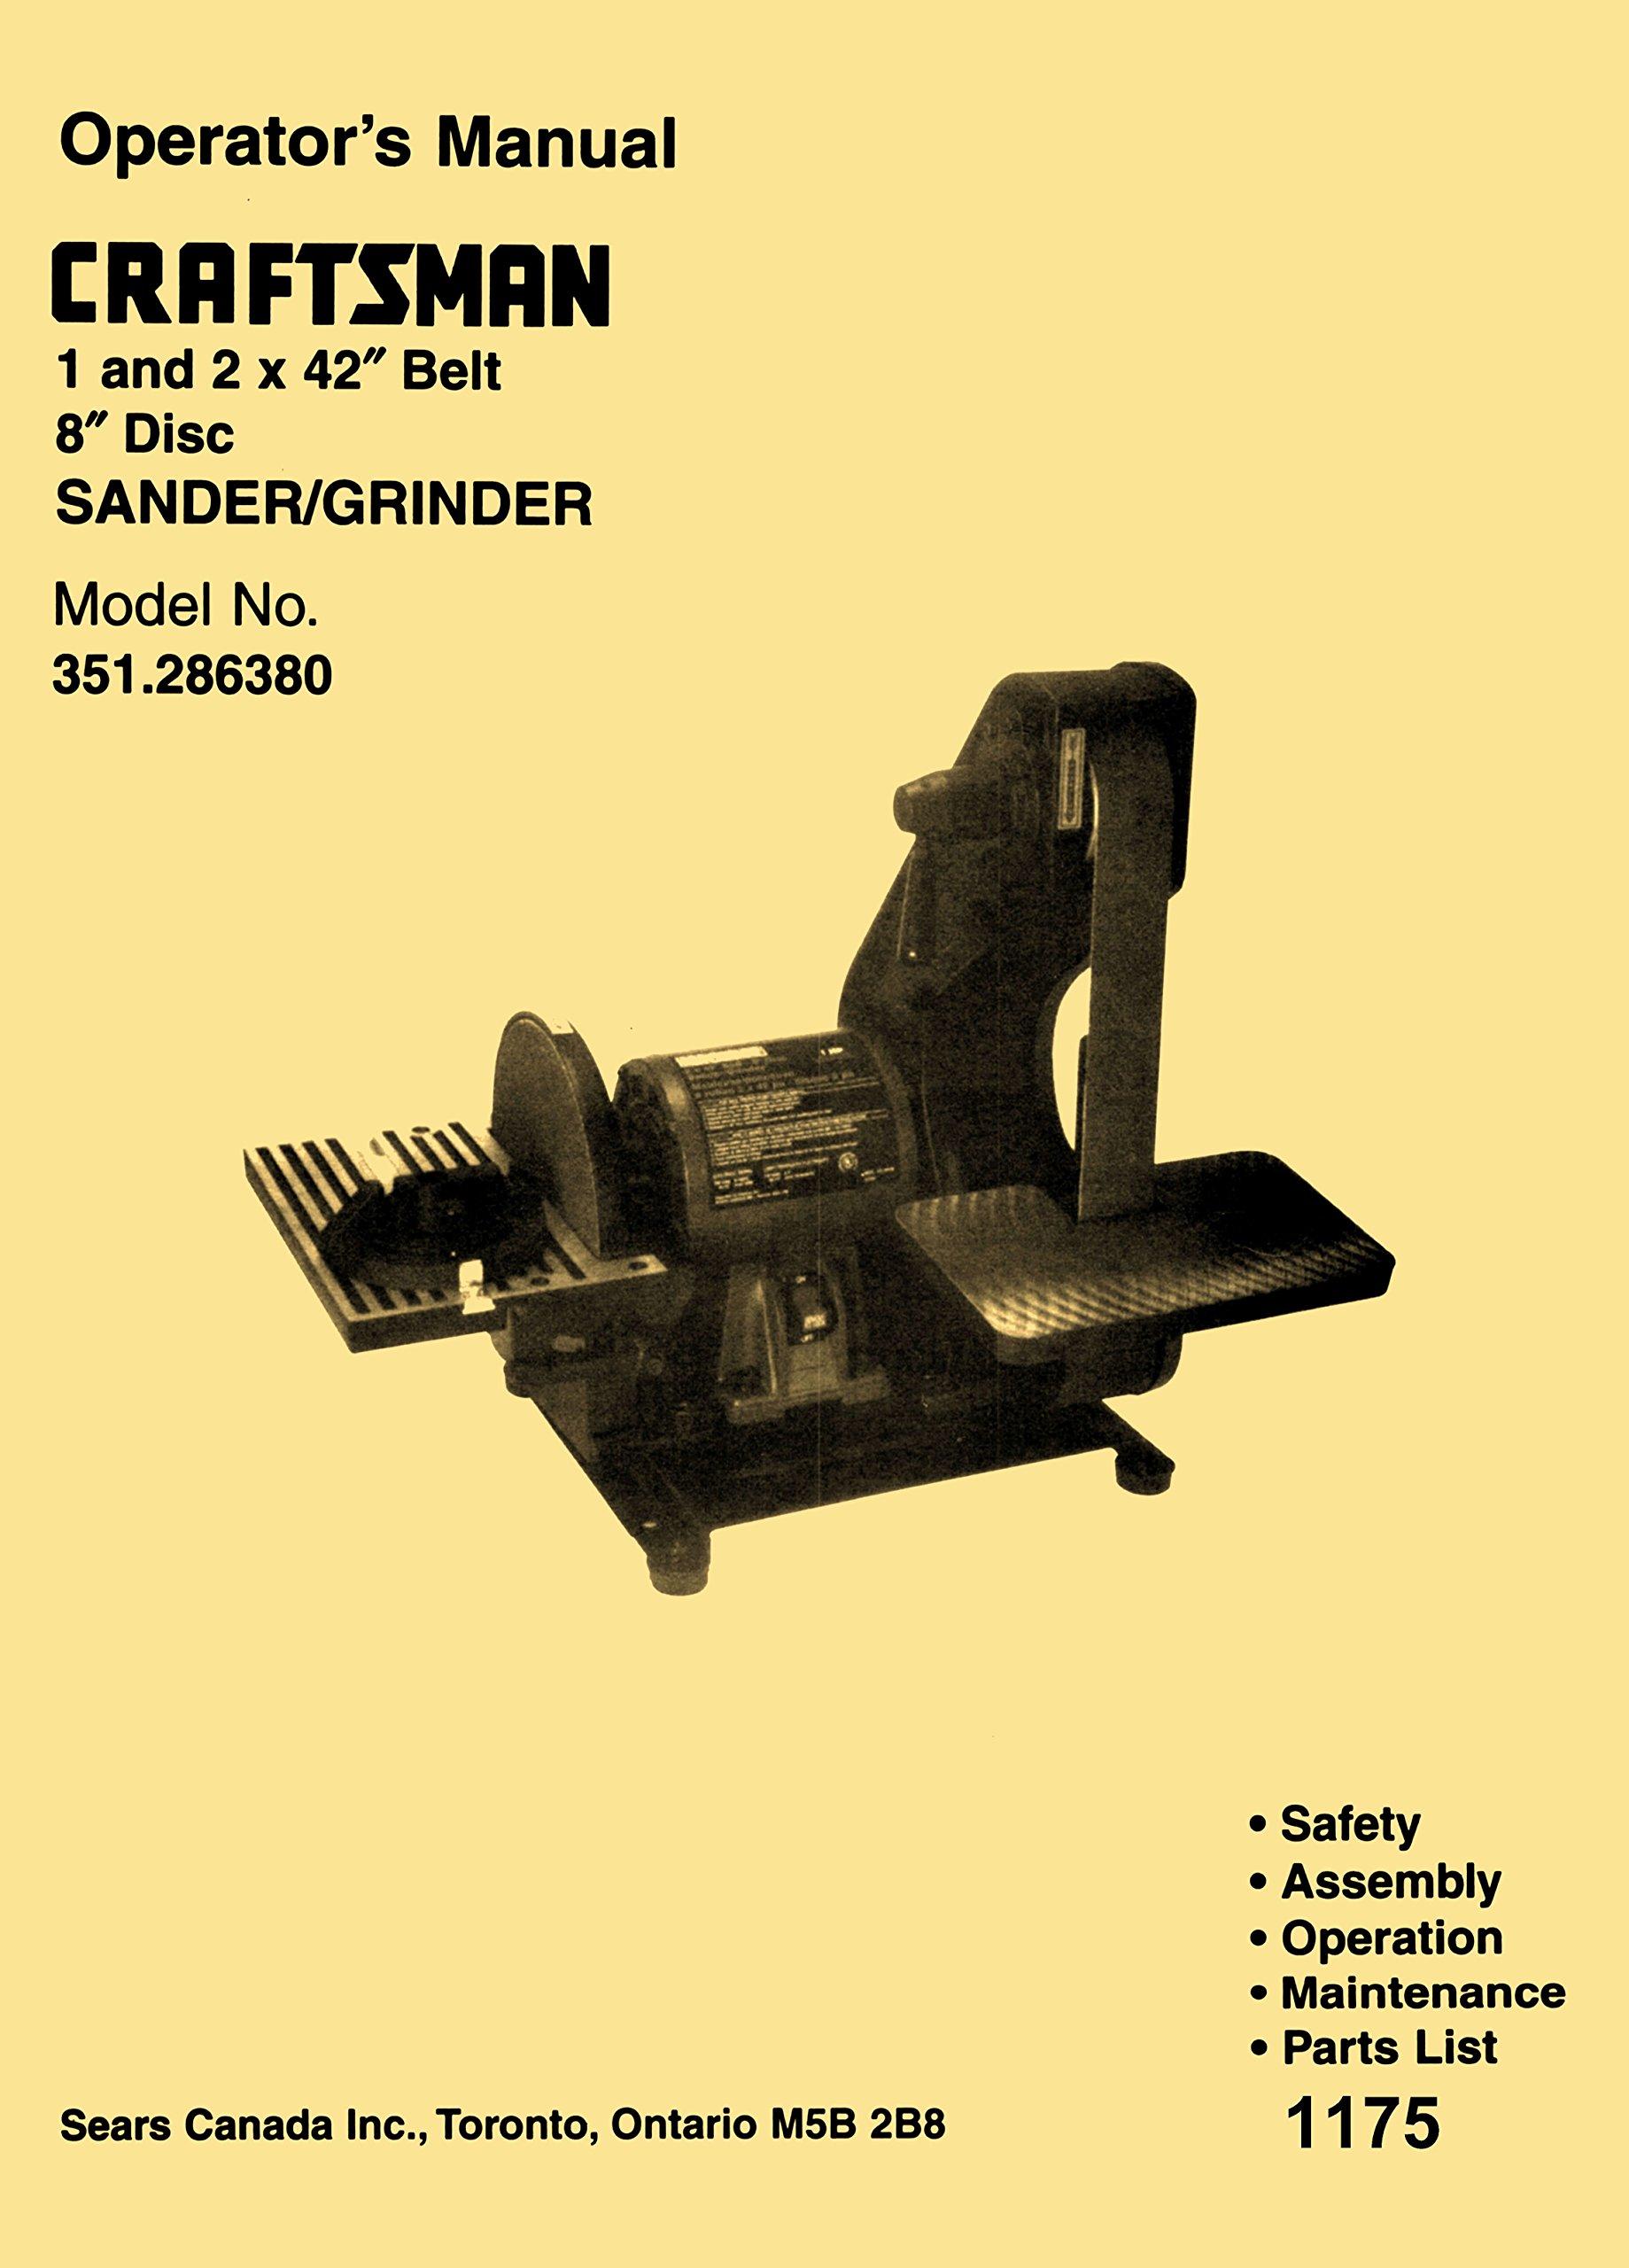 Craftsman 351.286380 1